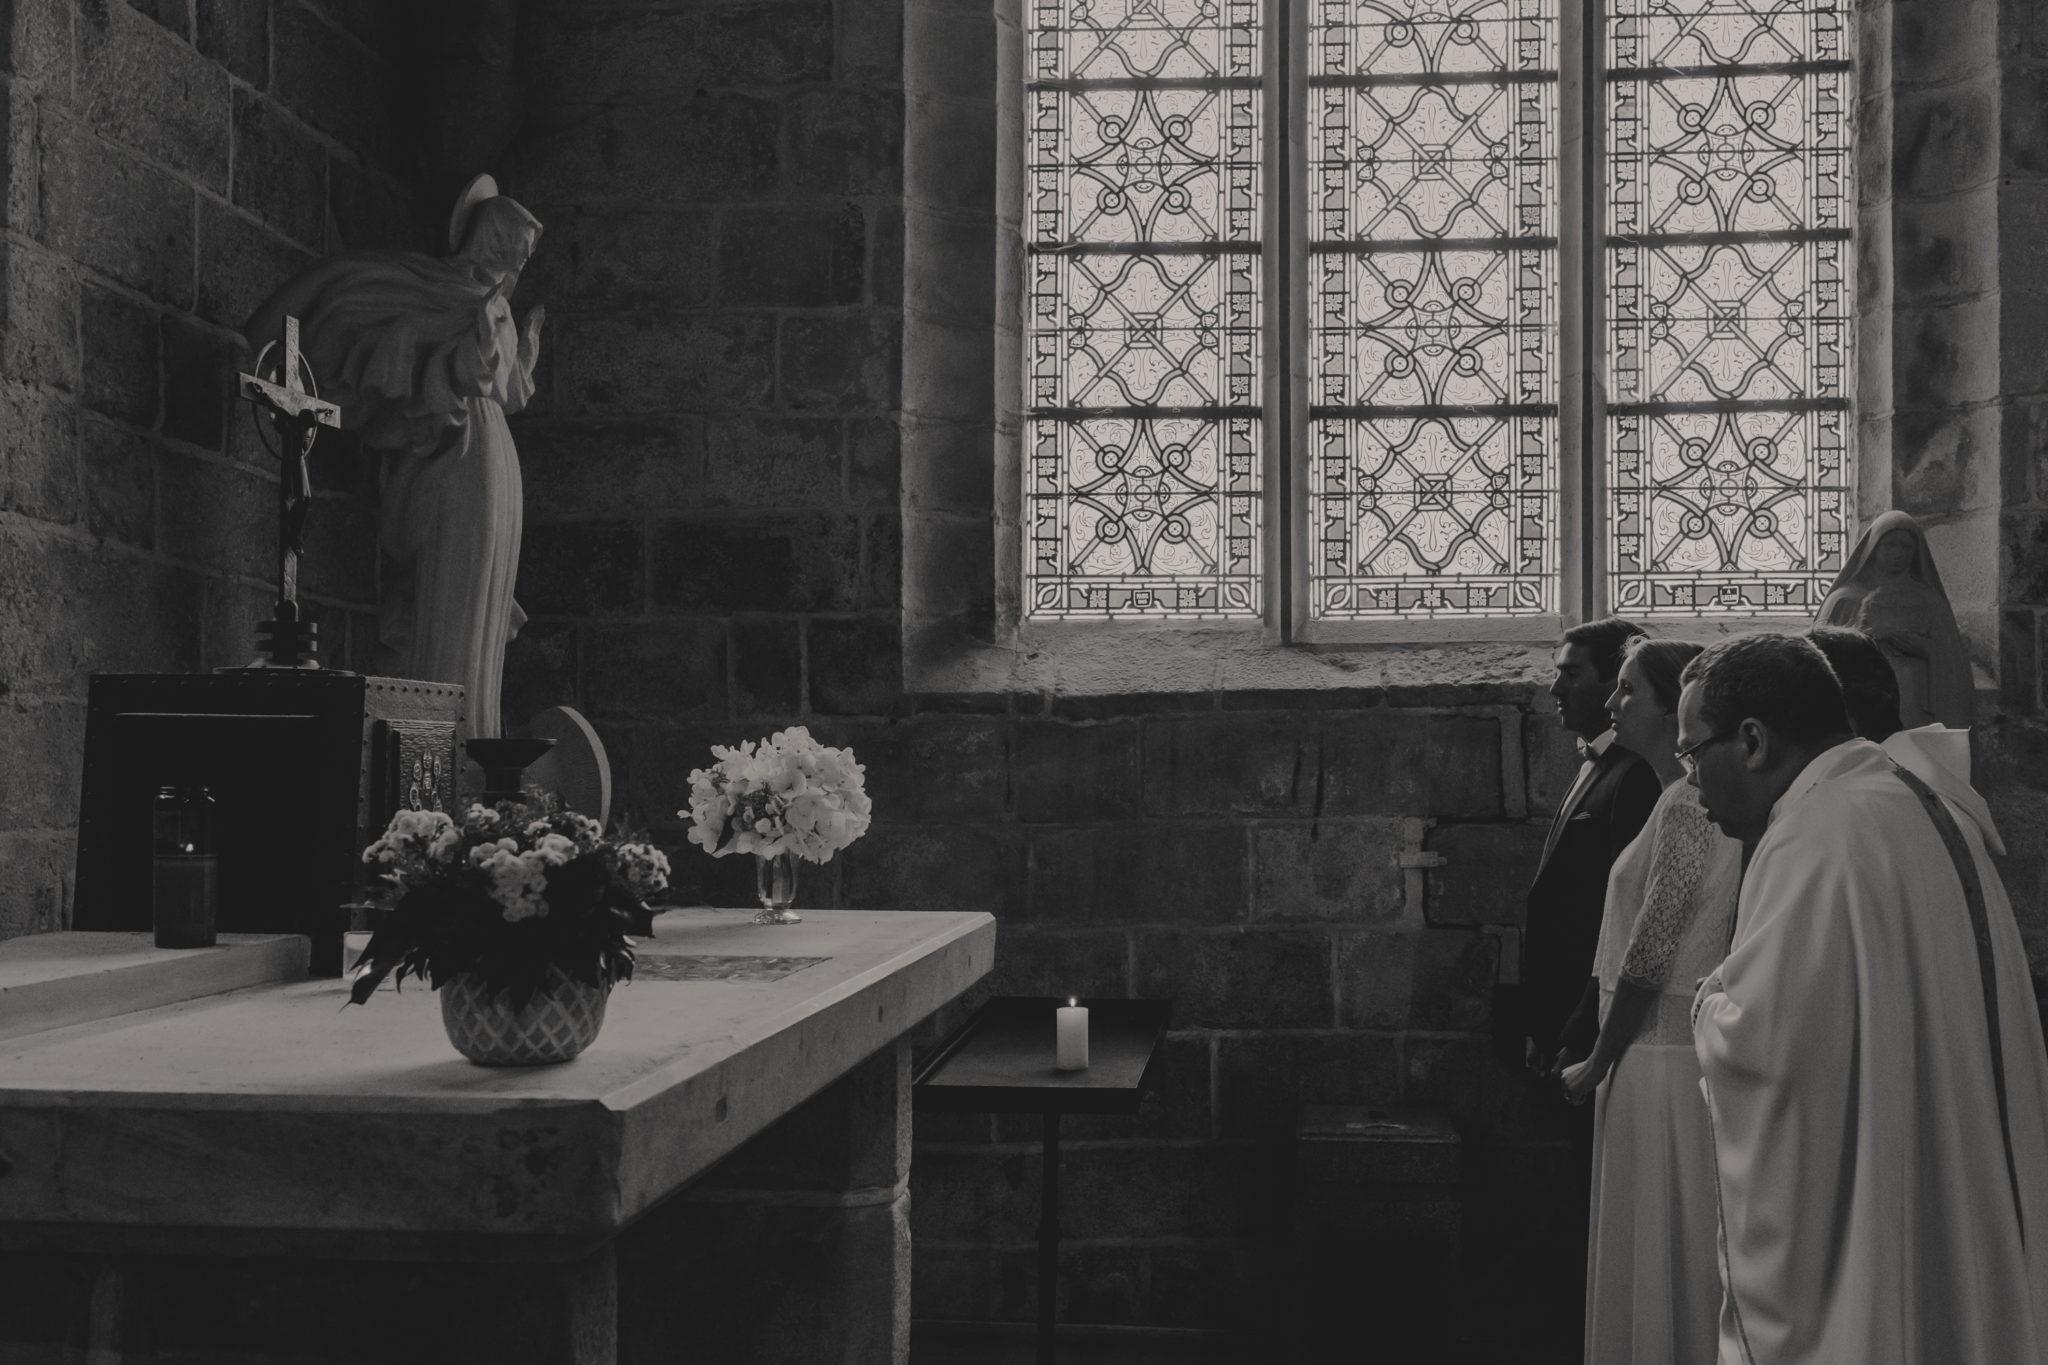 Cérémonie religieuse église Saint Valéry Varengeville sur Mer